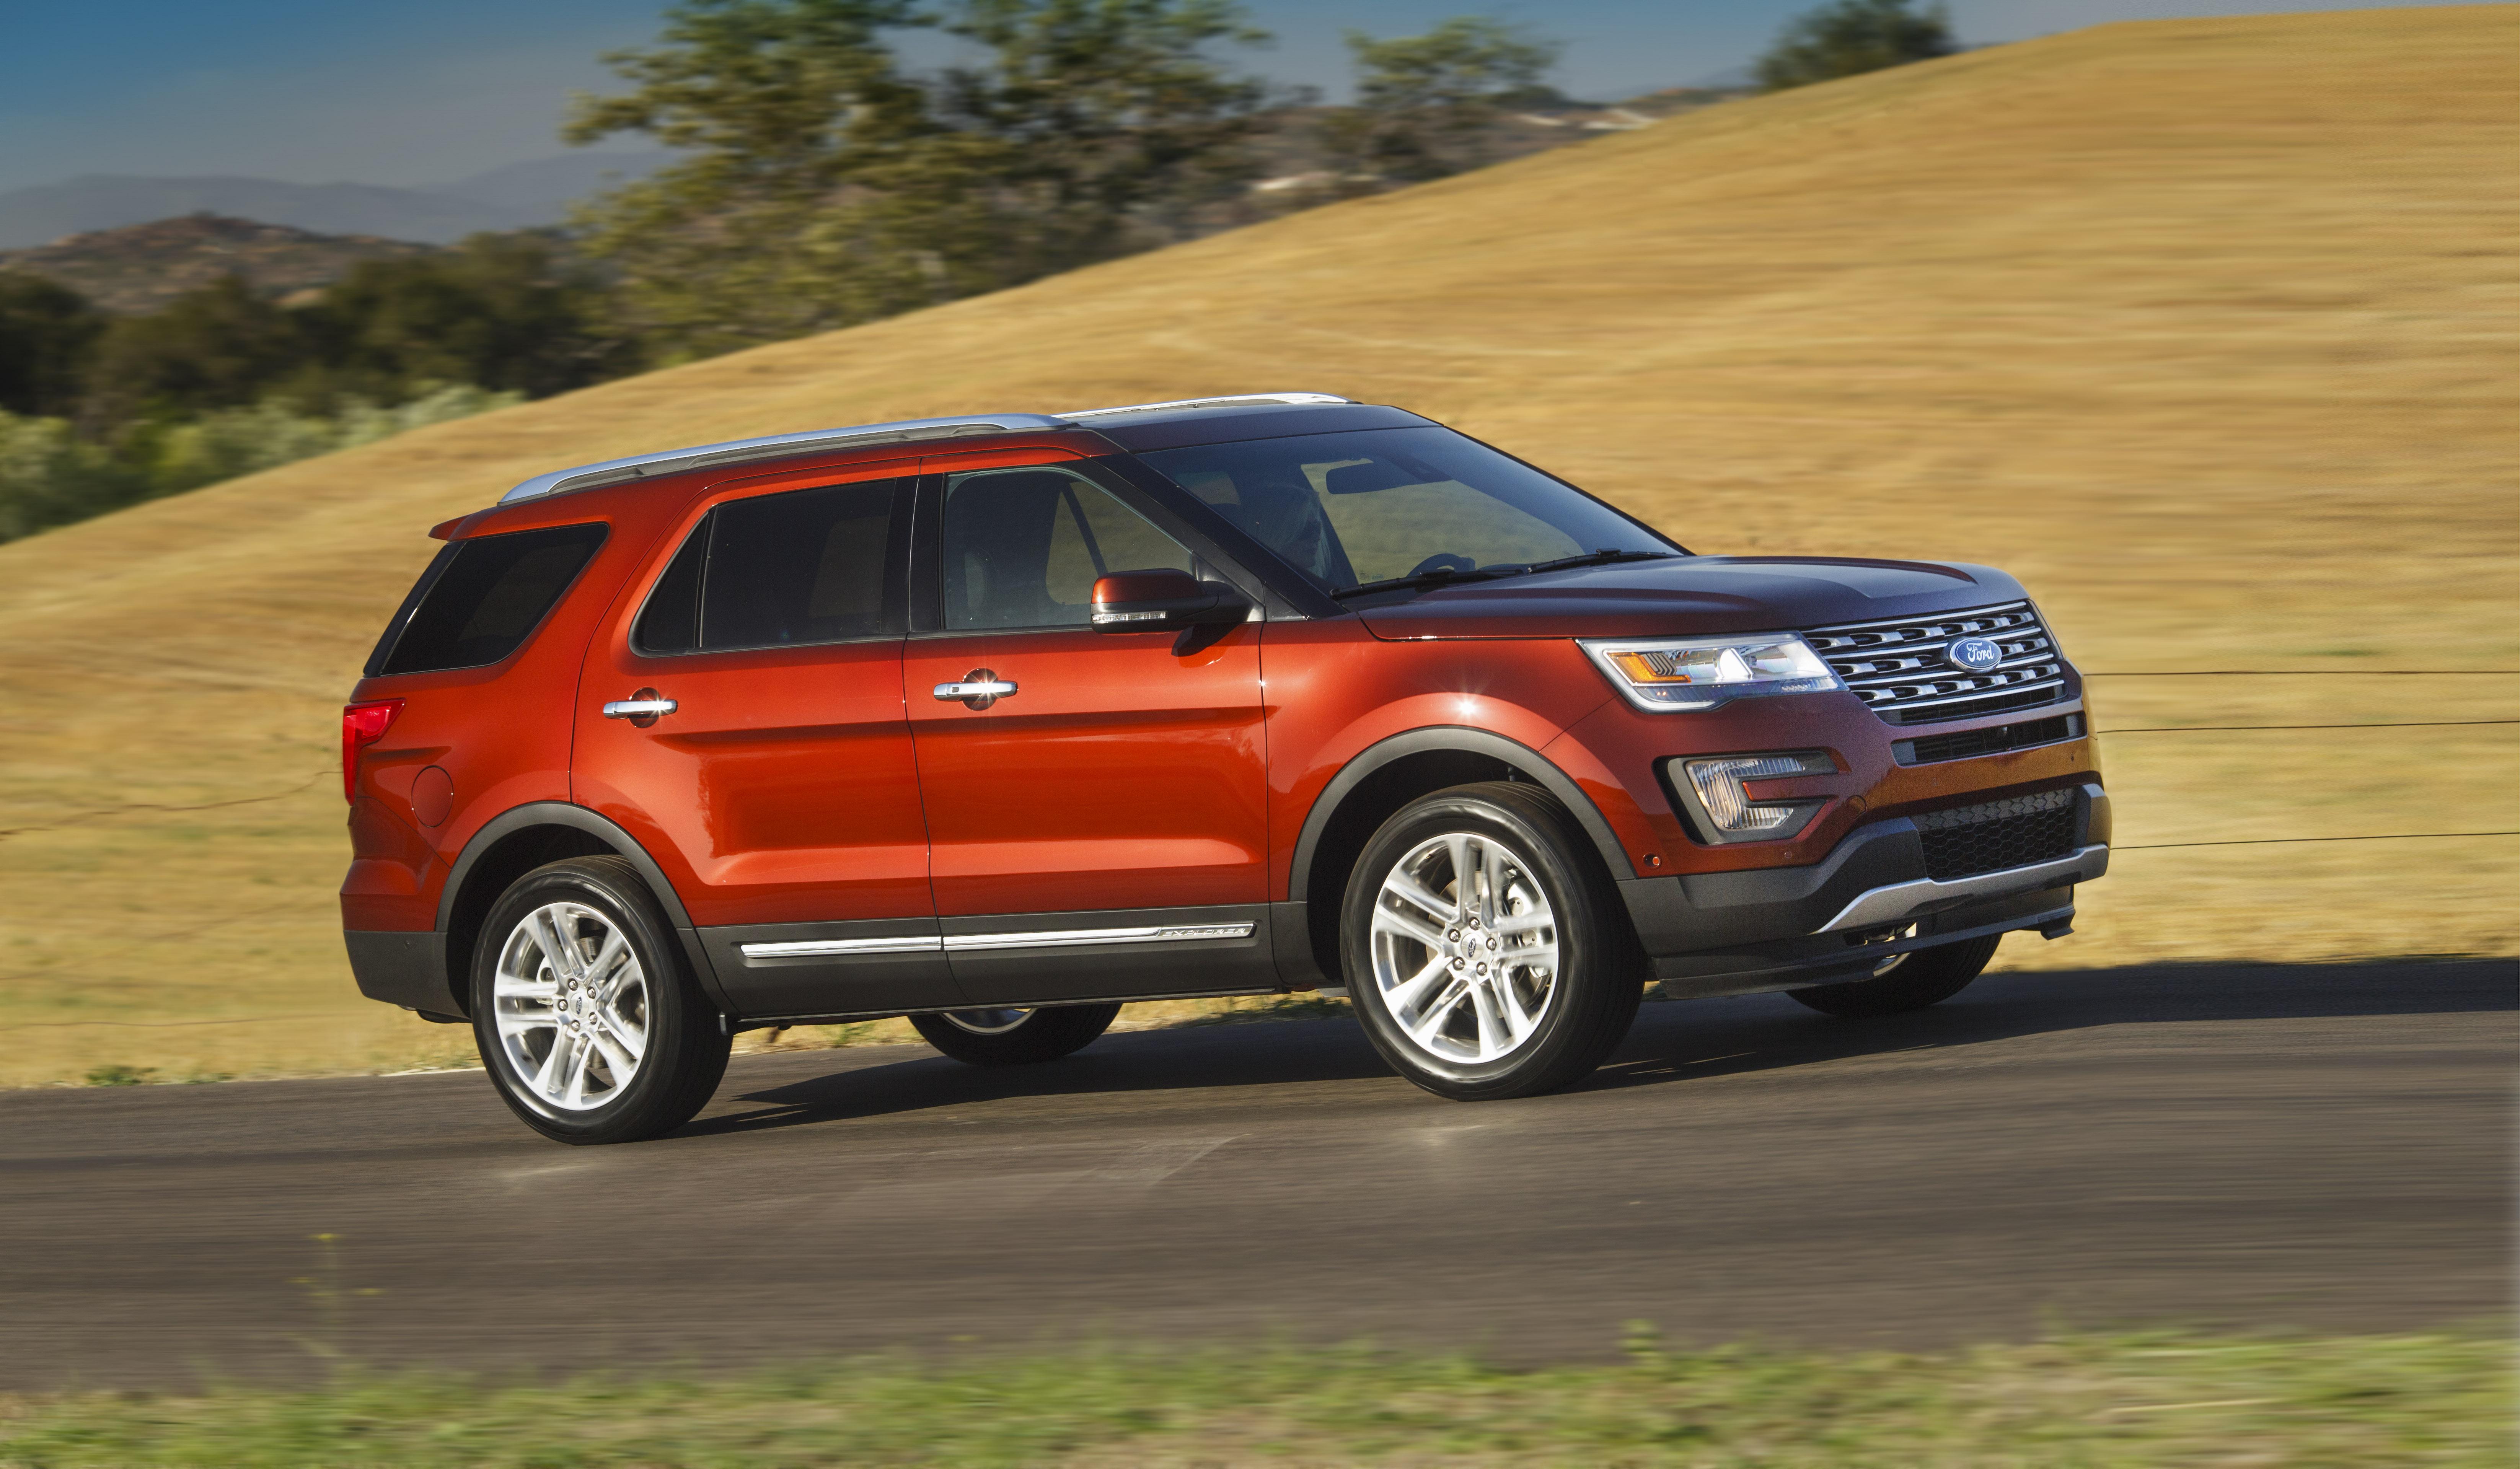 Ford Recalls Five Models for Parking Brakes